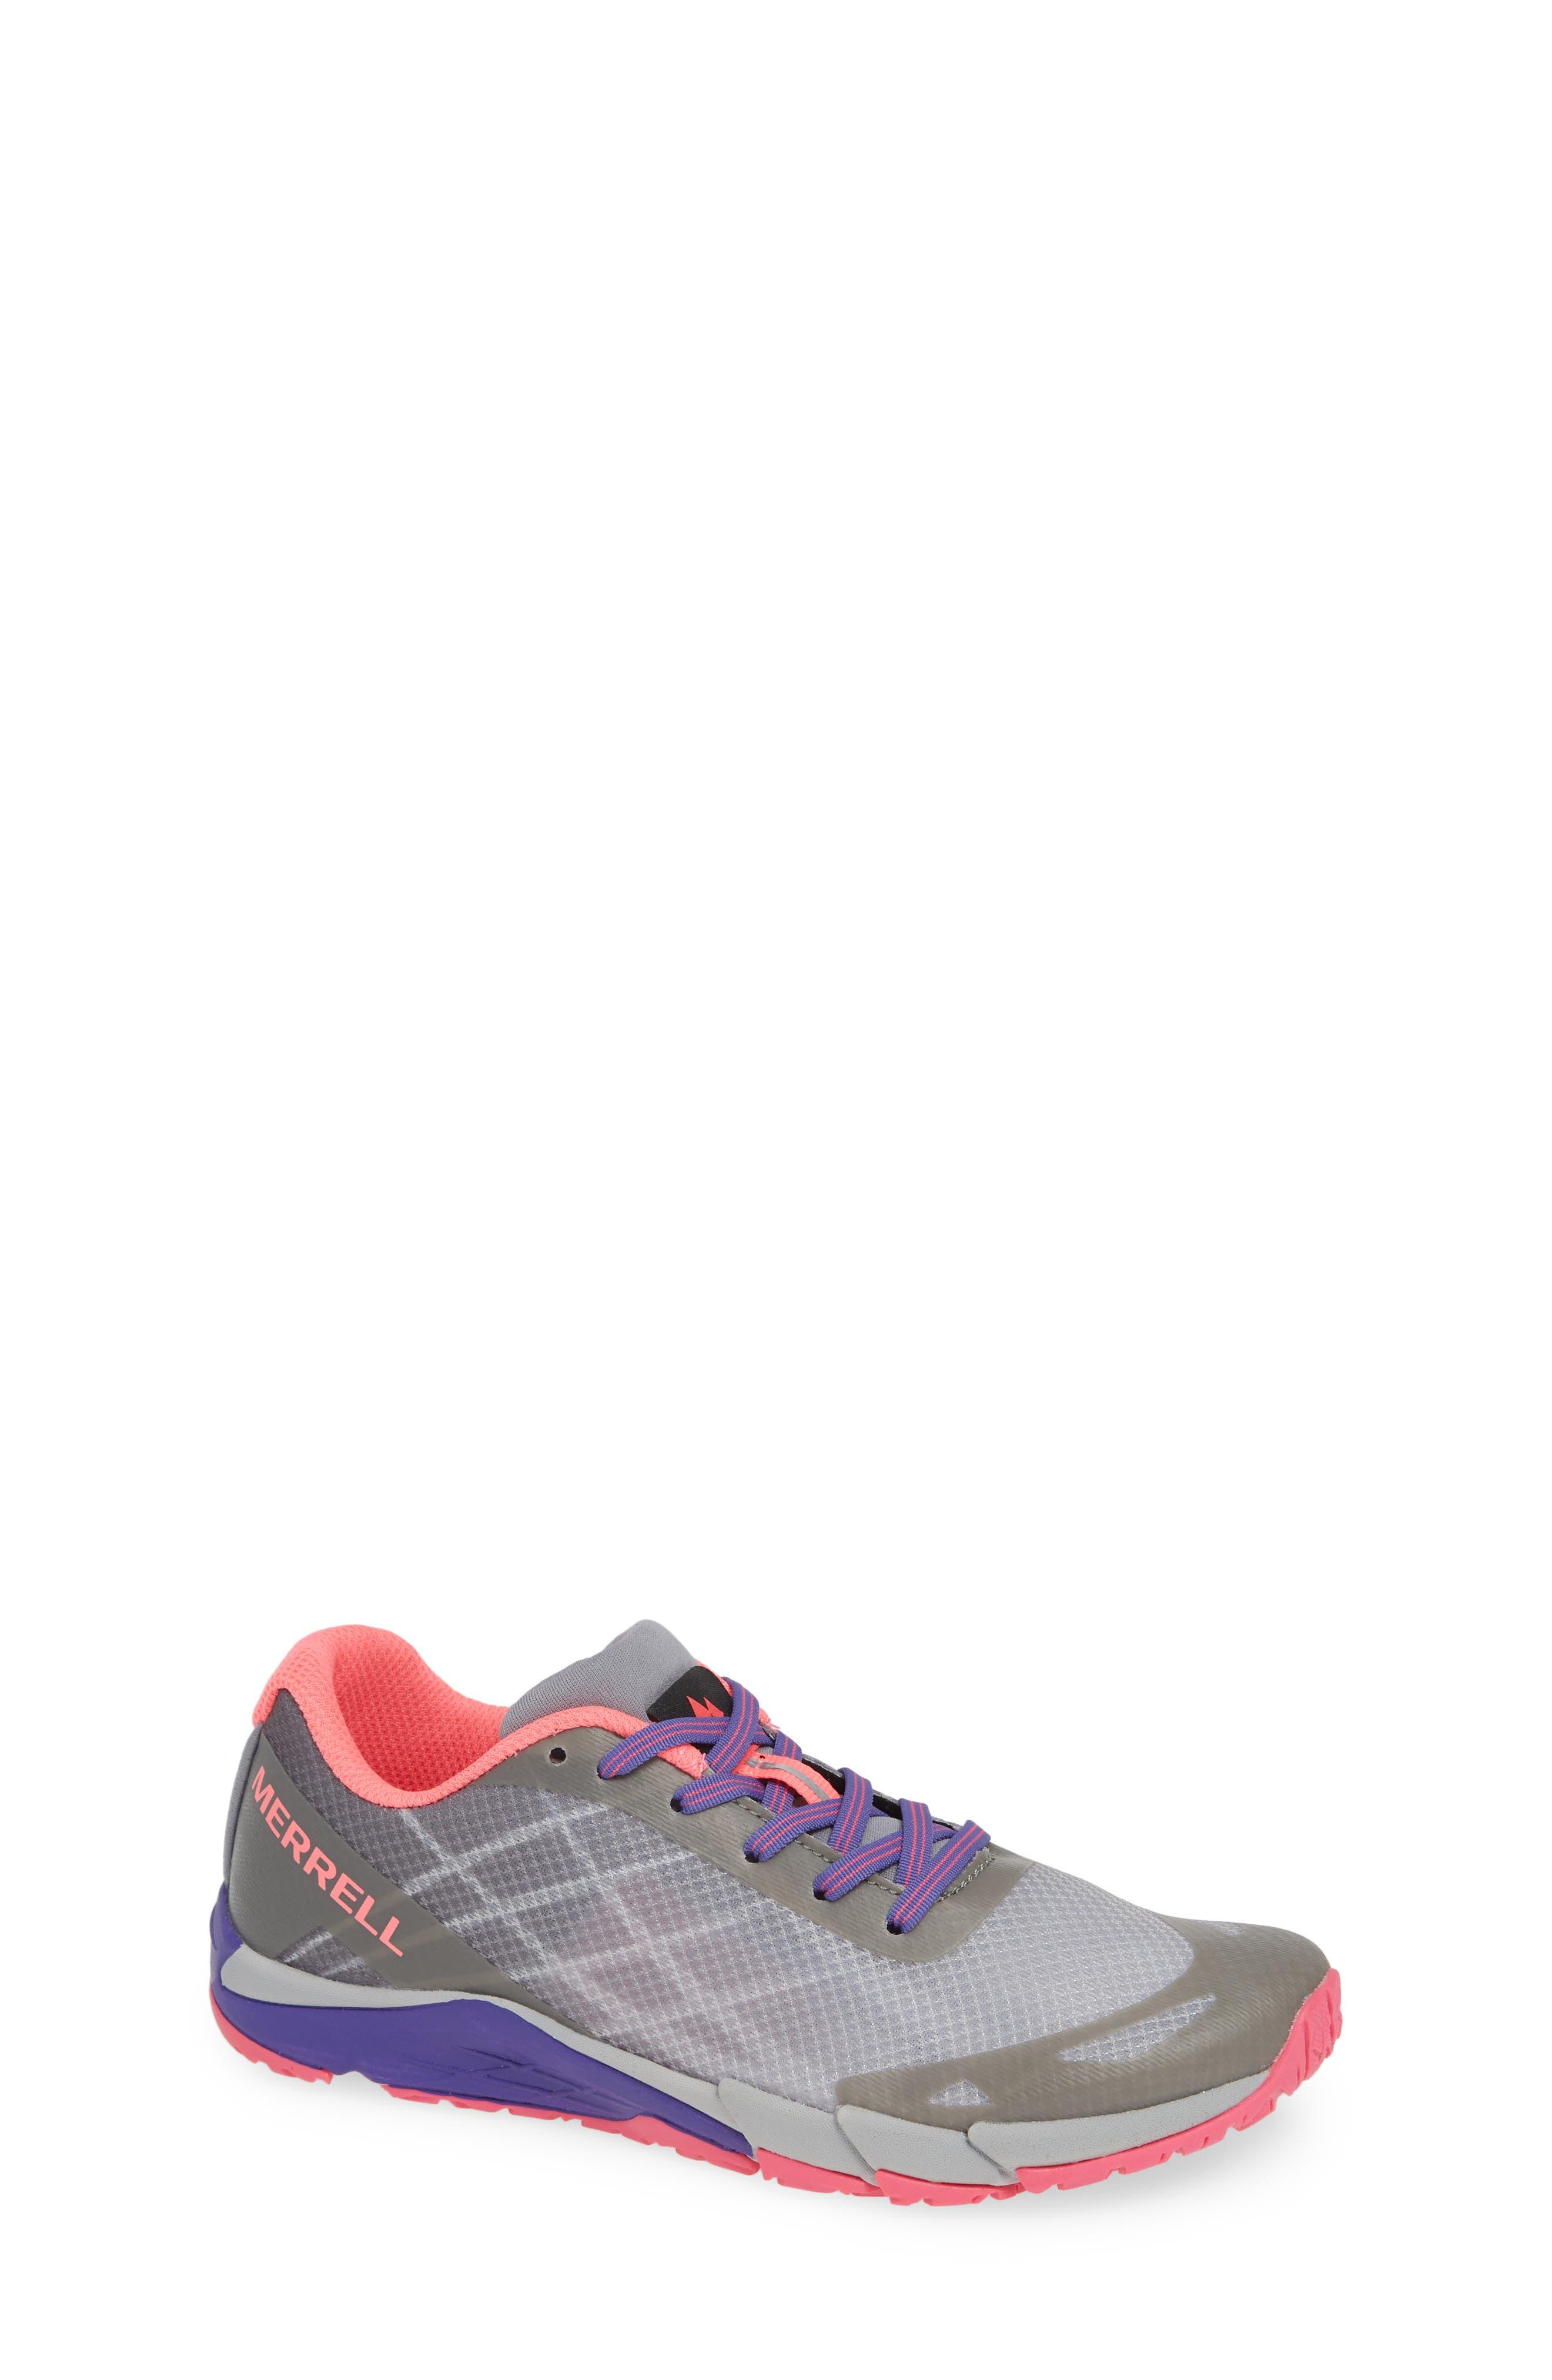 MERRELL, Bare Access Sneaker, Main thumbnail 1, color, GREY/ MULTI SYNTHETIC